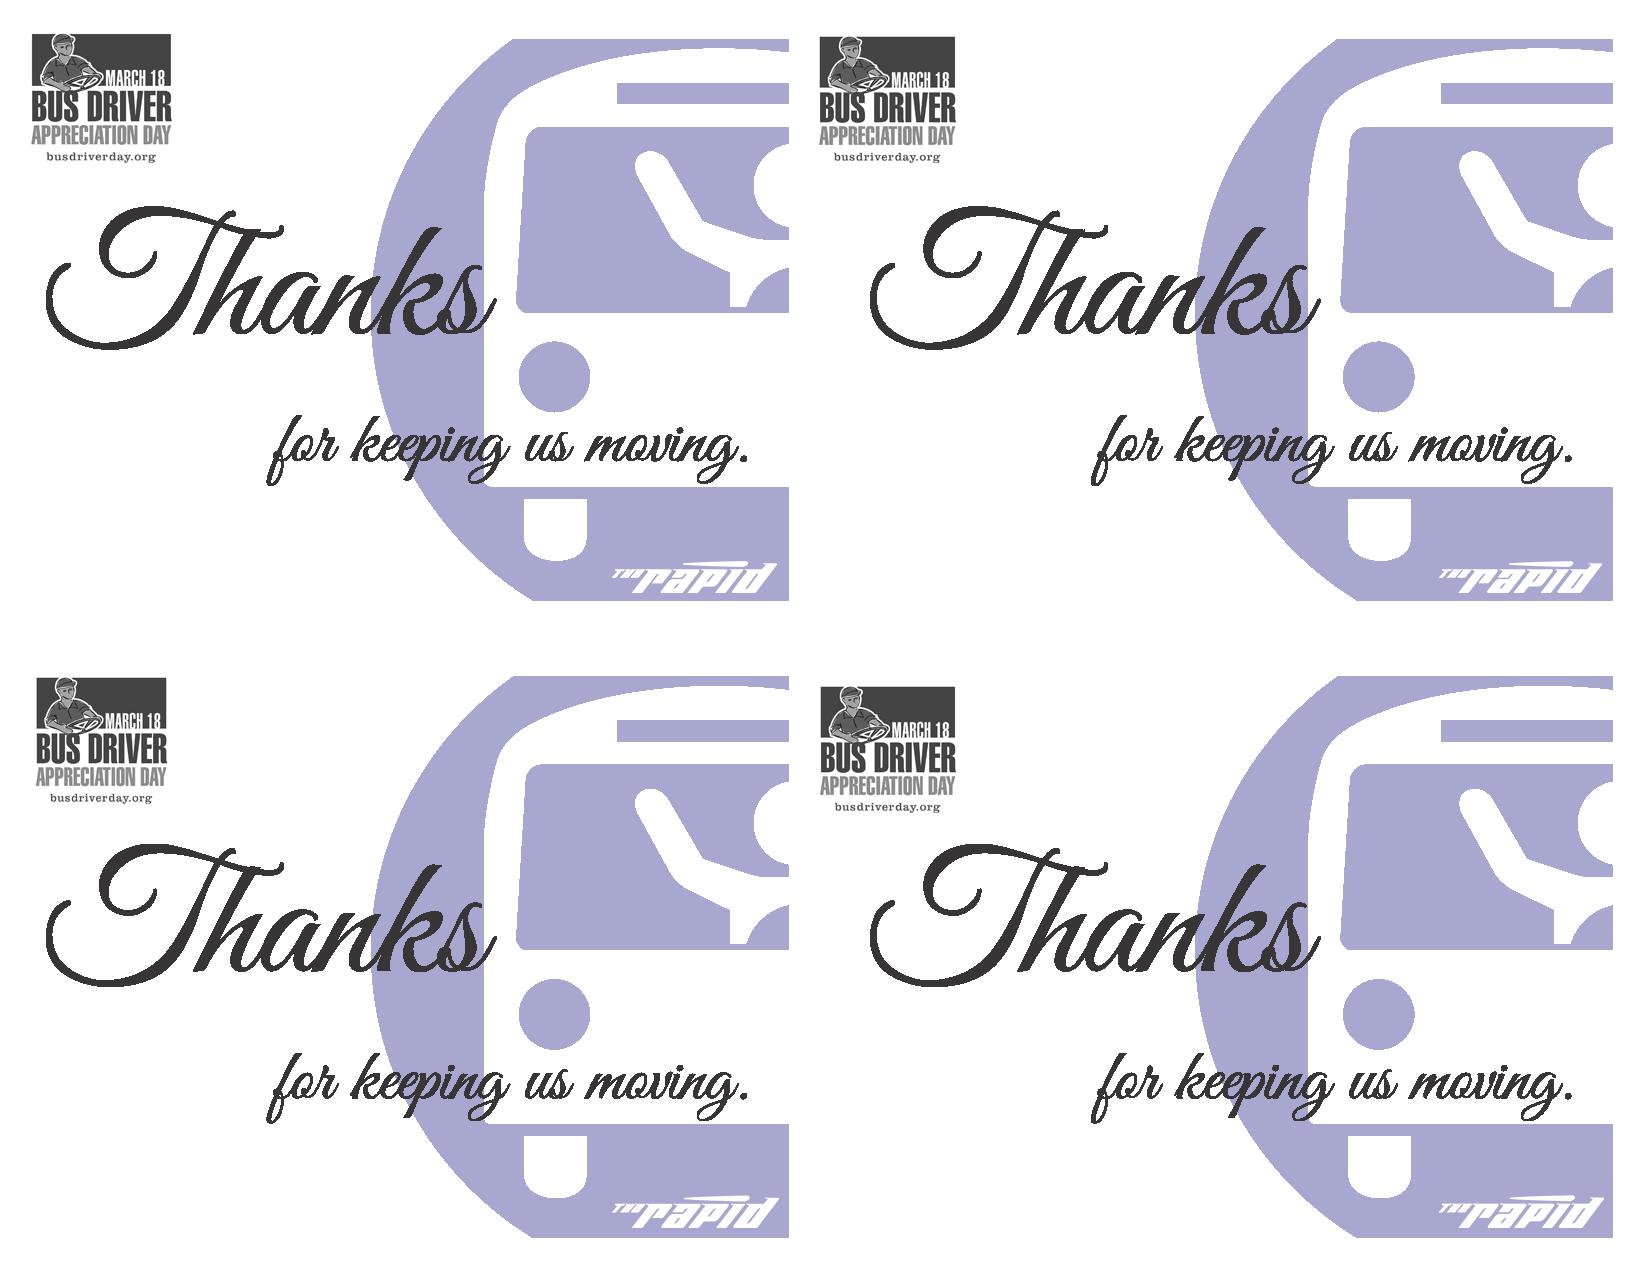 bus driver appreciation day is march 16 2018